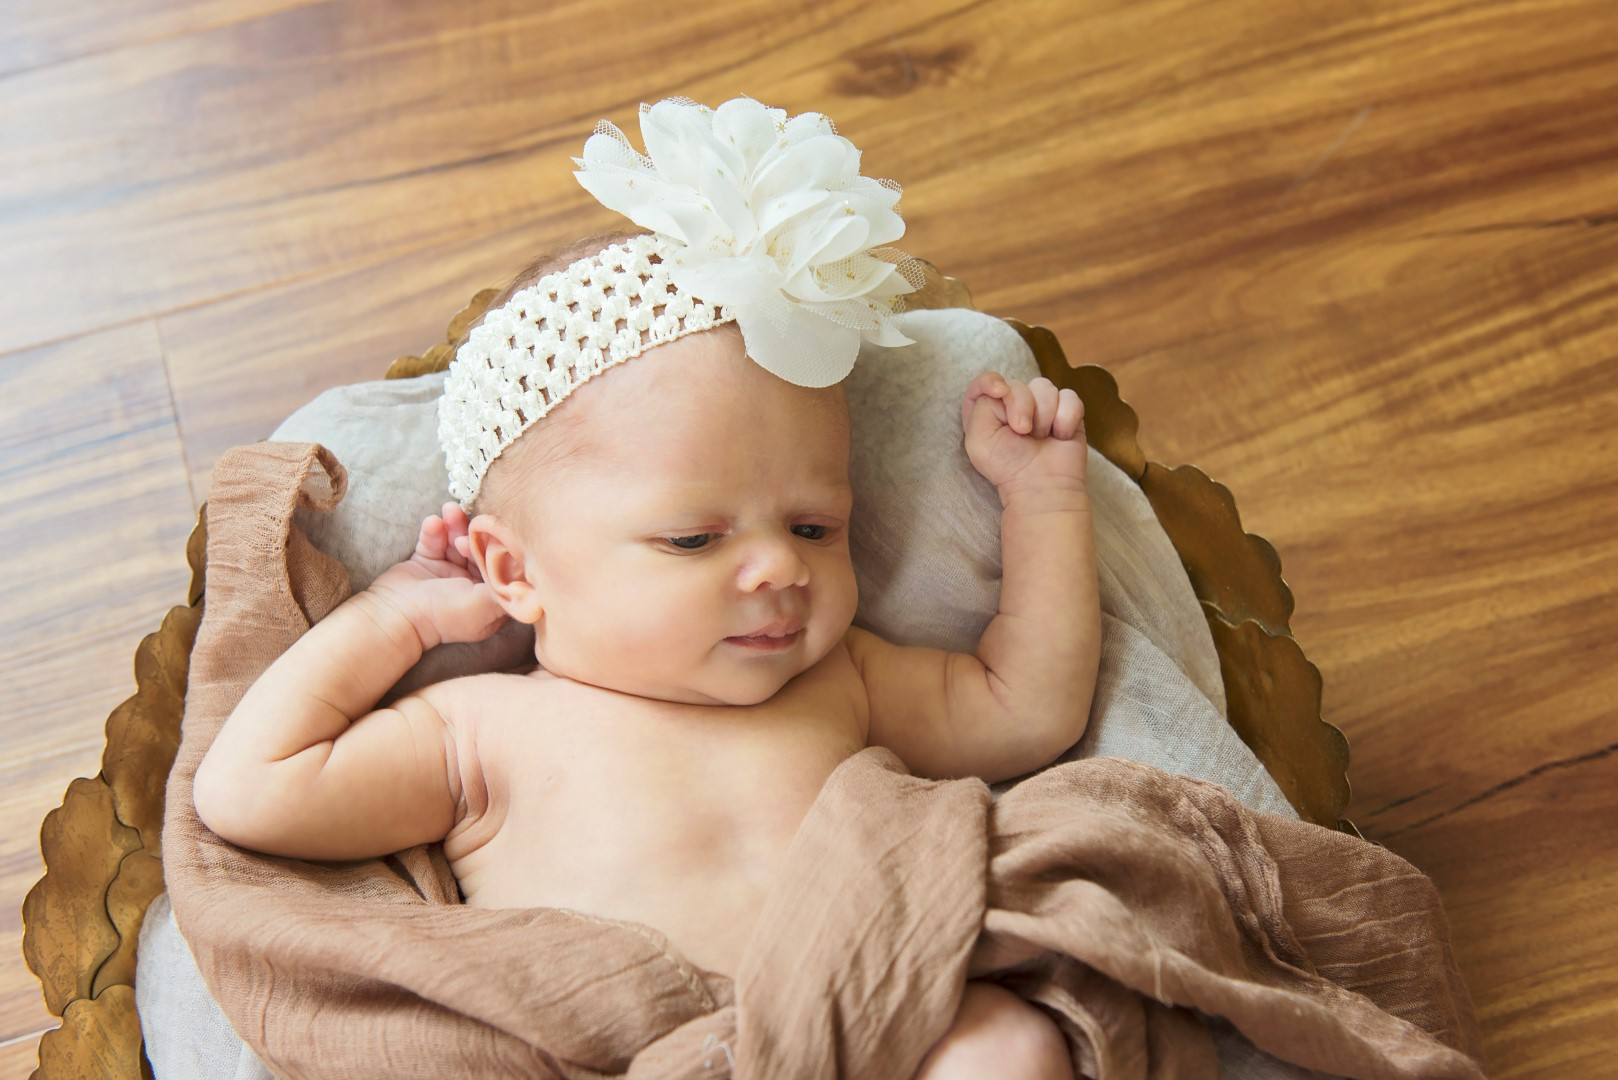 Baby_Parker_Newborn_17 (Large).jpg